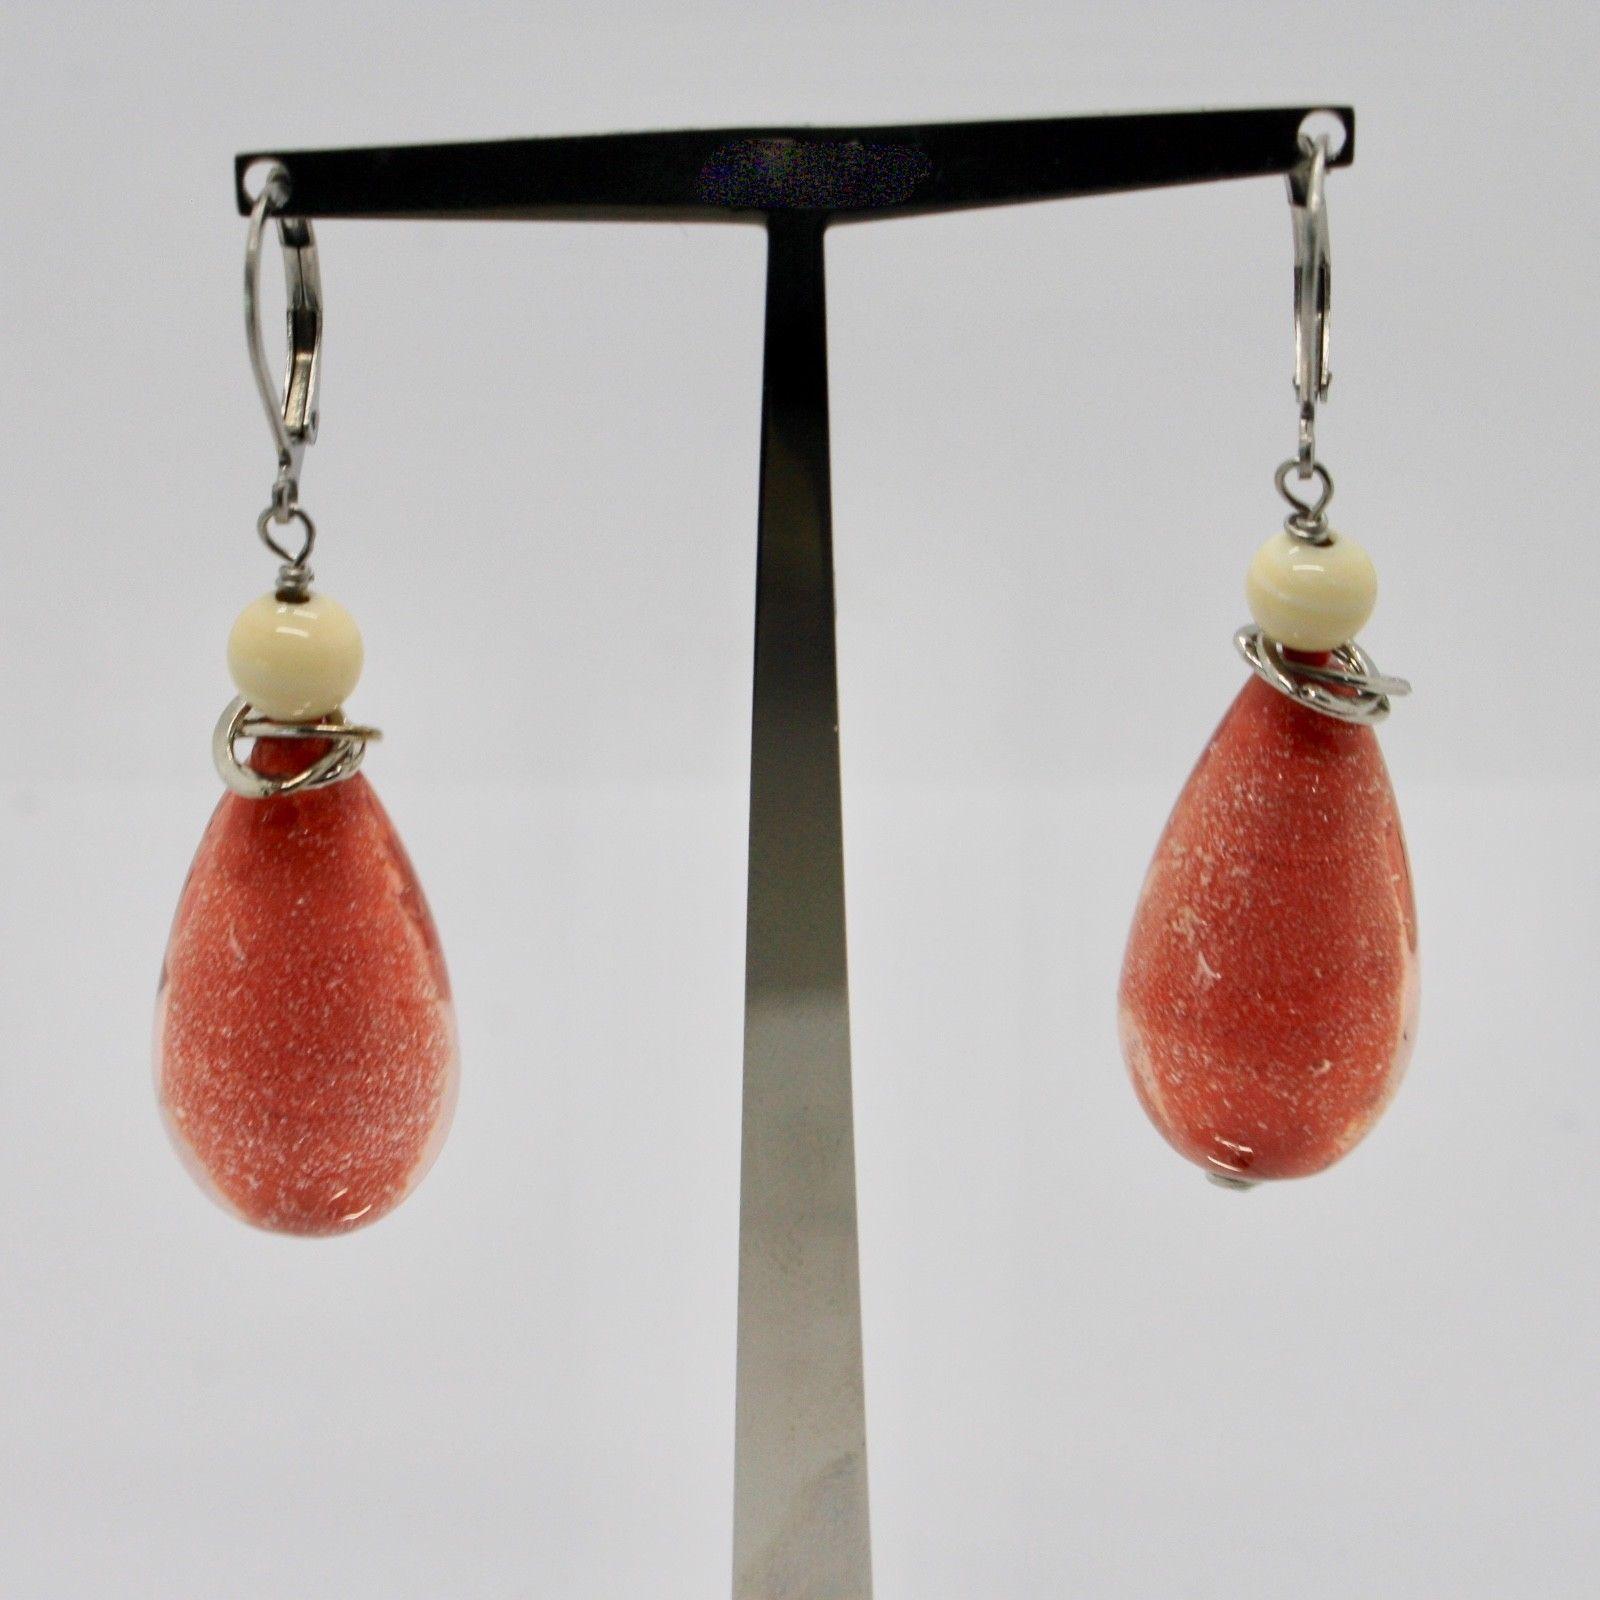 EARRINGS ANTICA MURRINA VENEZIA WITH MURANO GLASS DROP RED OR540A25